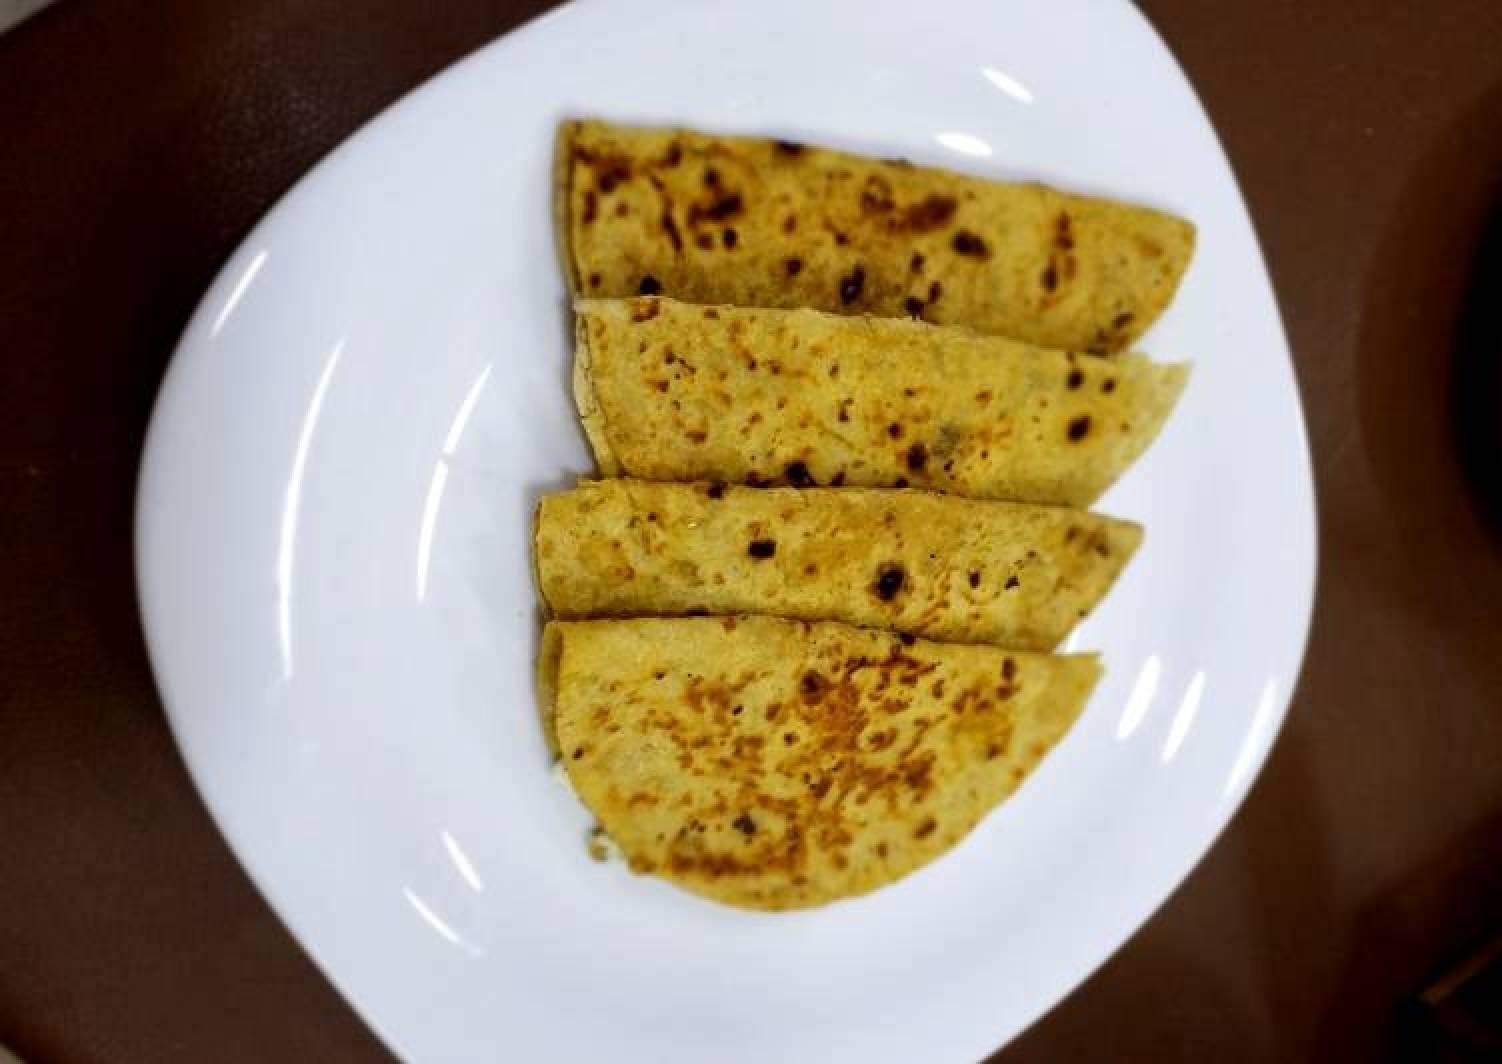 Rotli stuffed with Jibno and Mint Jibna Feta cheese Sudan